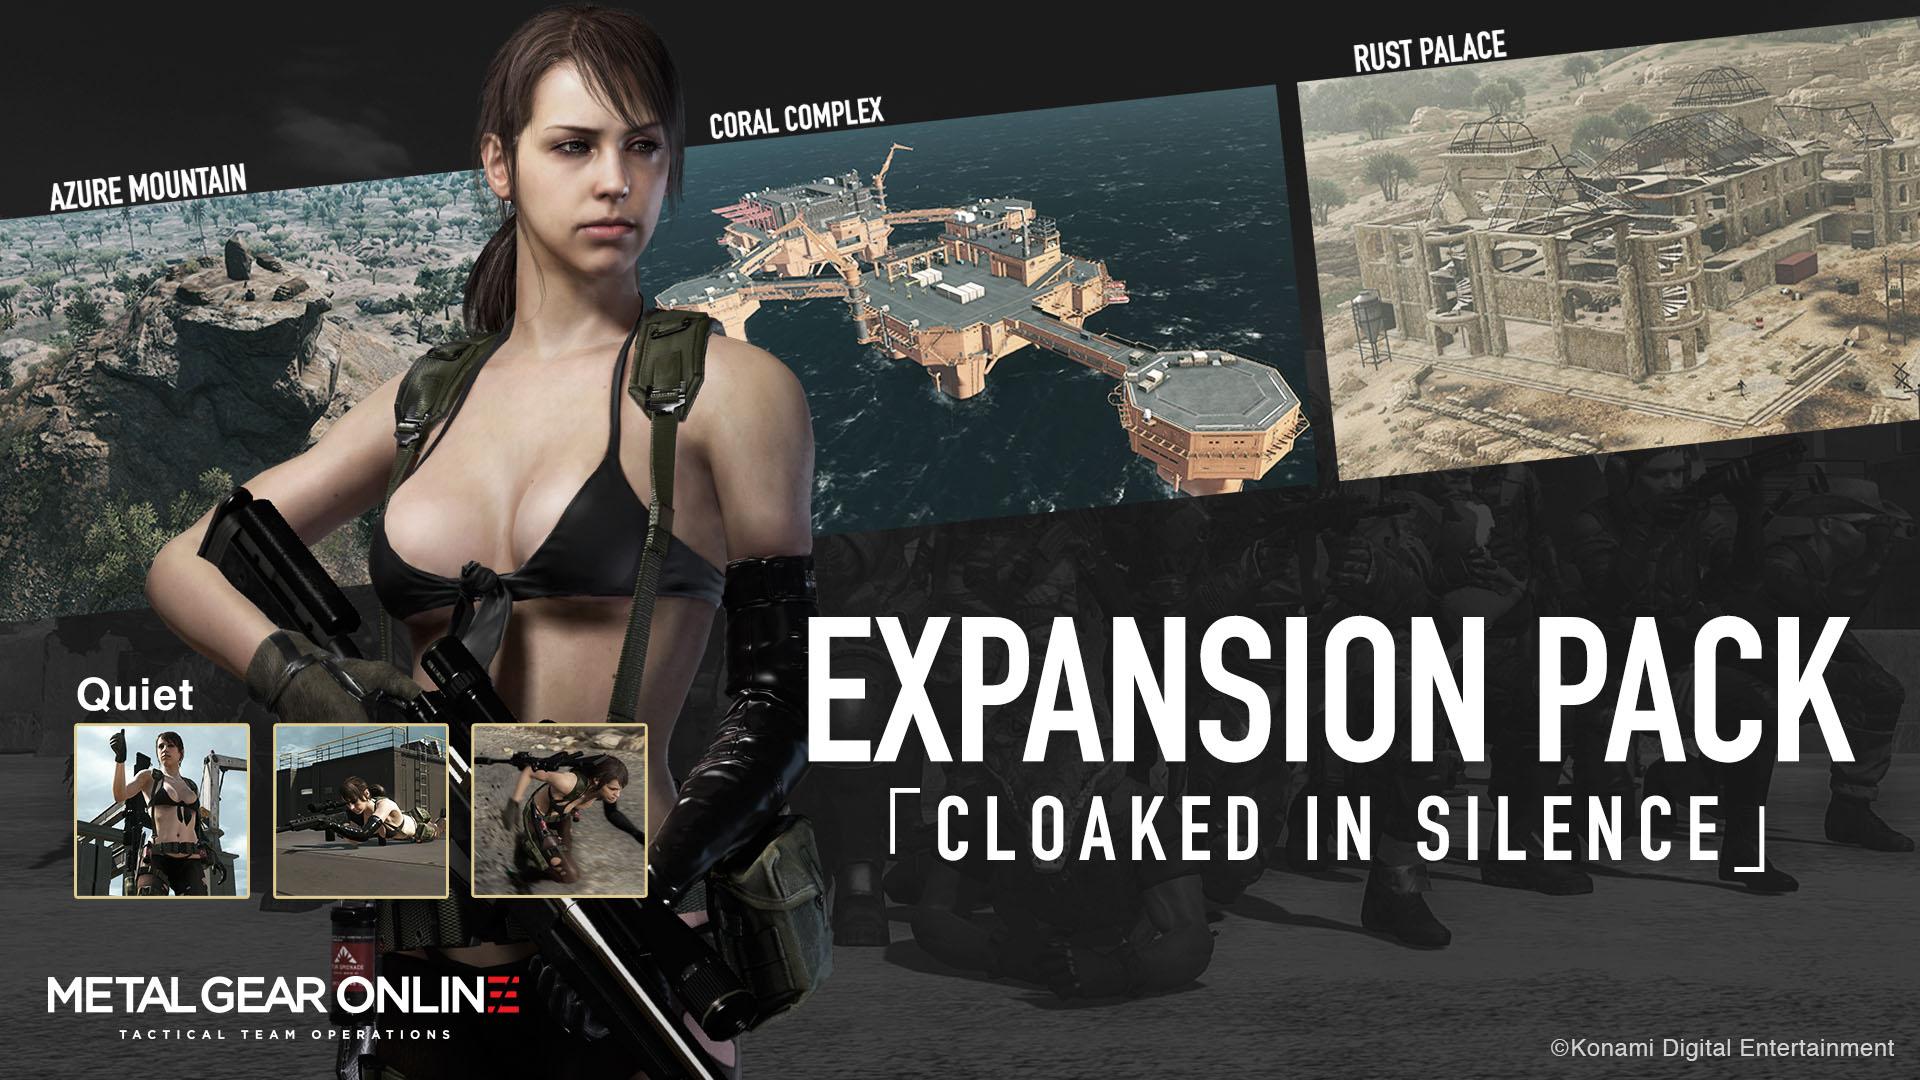 Metal Gear Online Cloaked-in-Silence